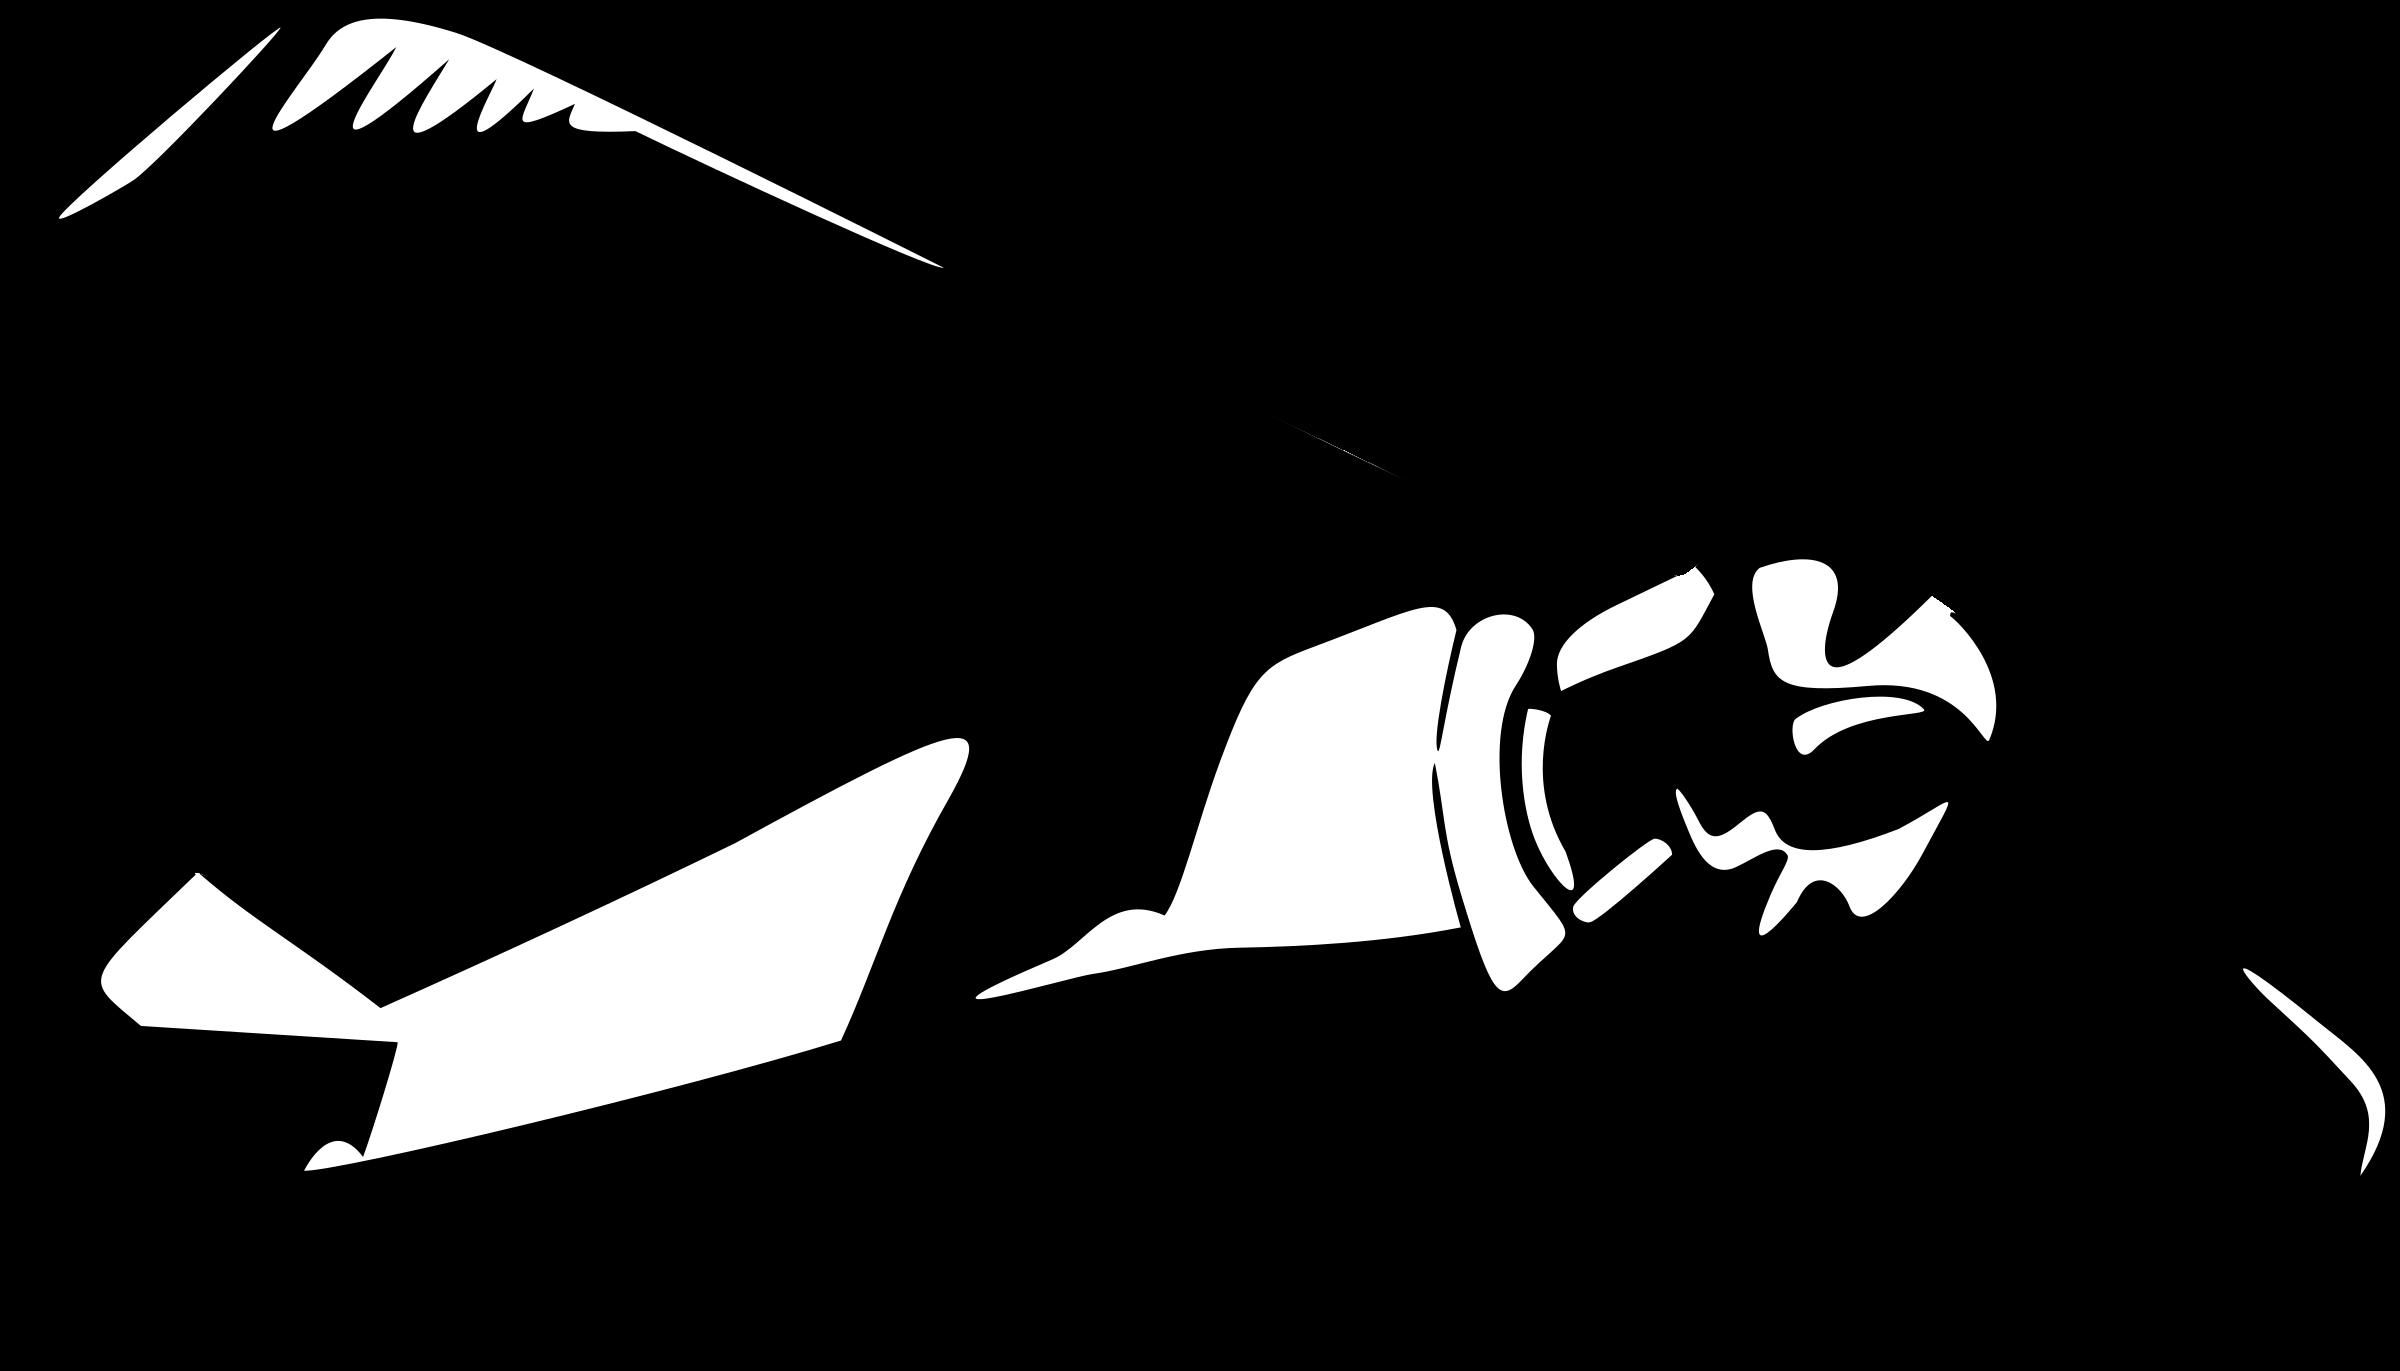 collection of ww. Clipart plane stencil